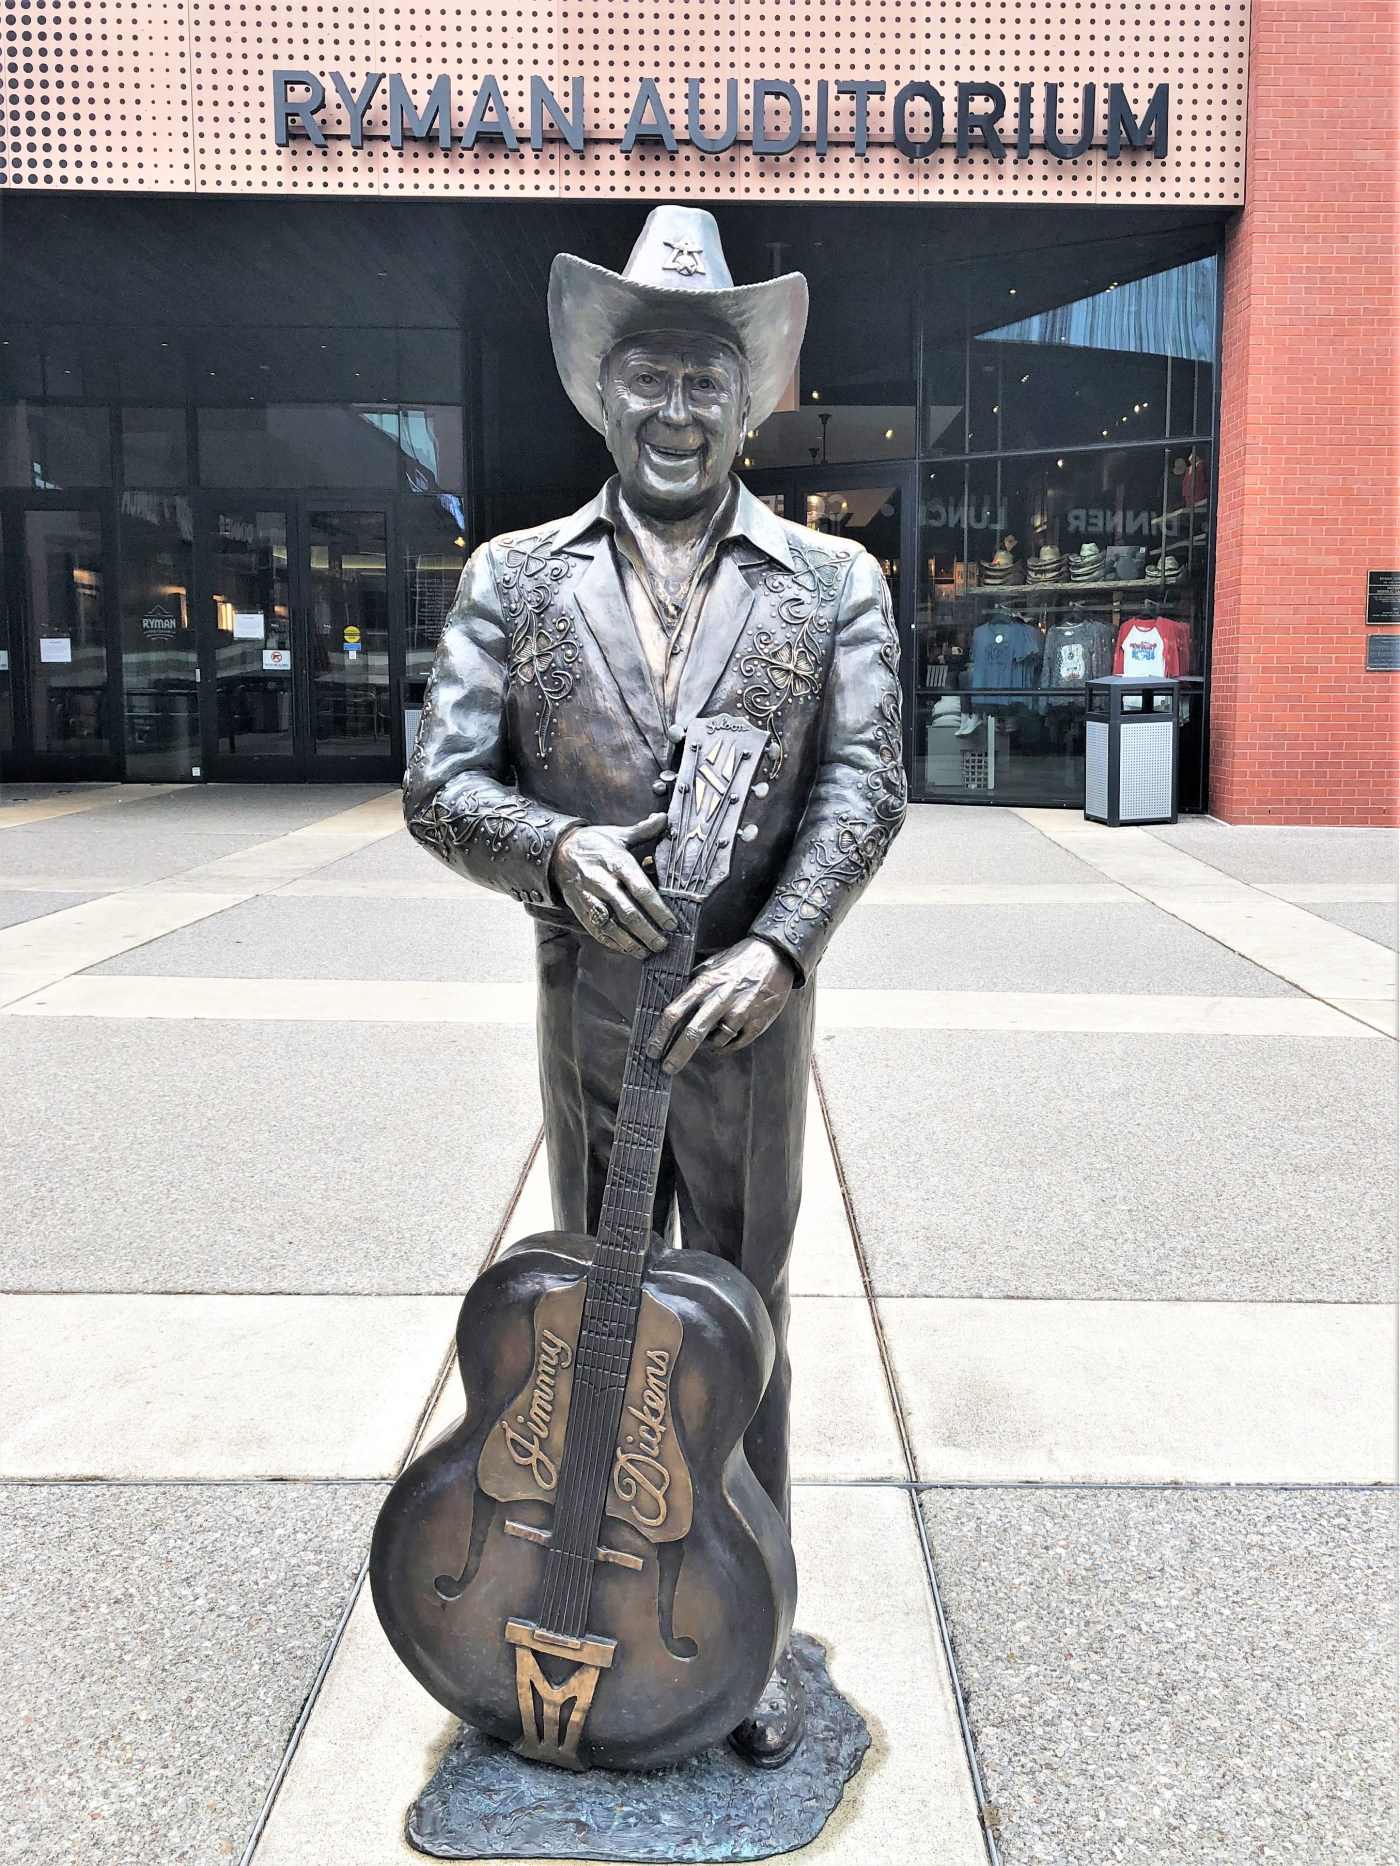 Dickens Sculpture Ryman Nashville street art